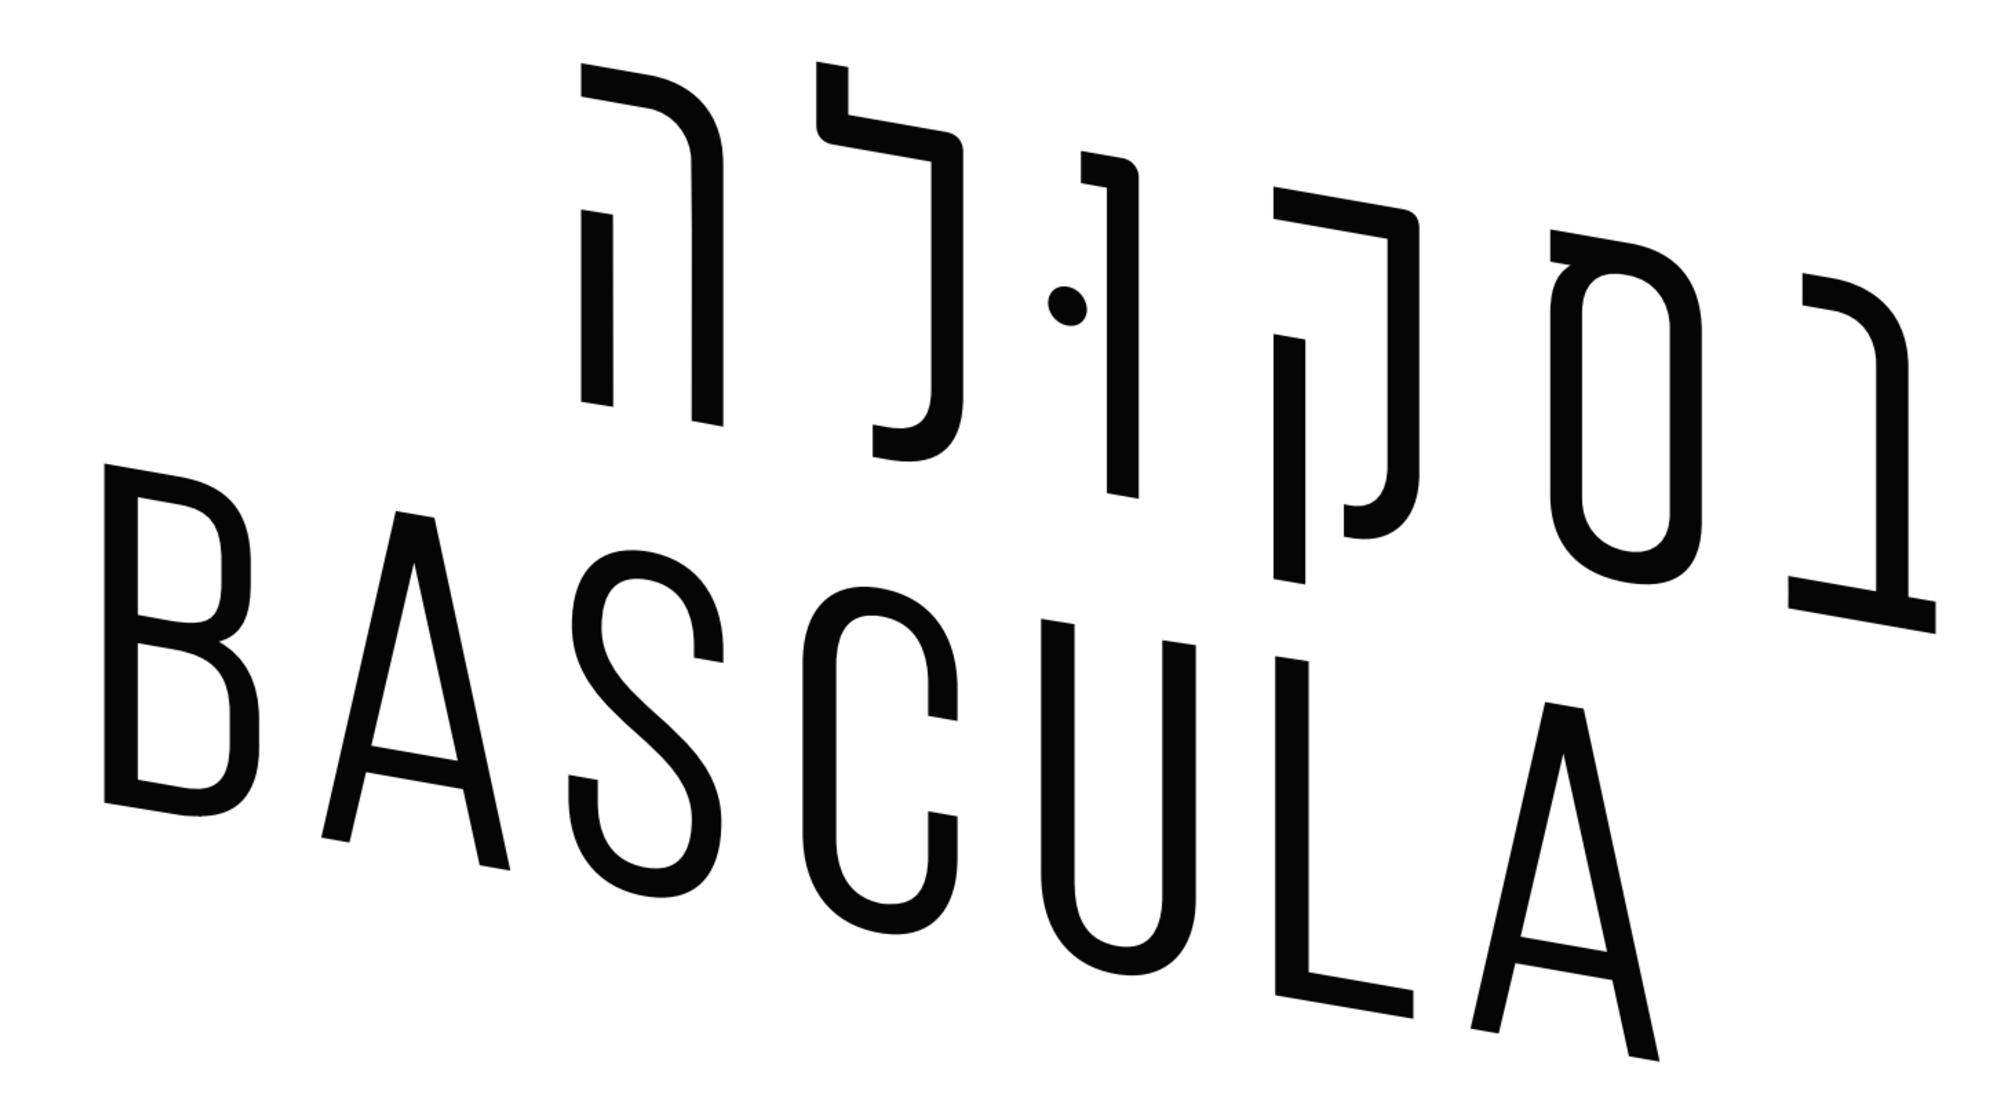 Bascula?>